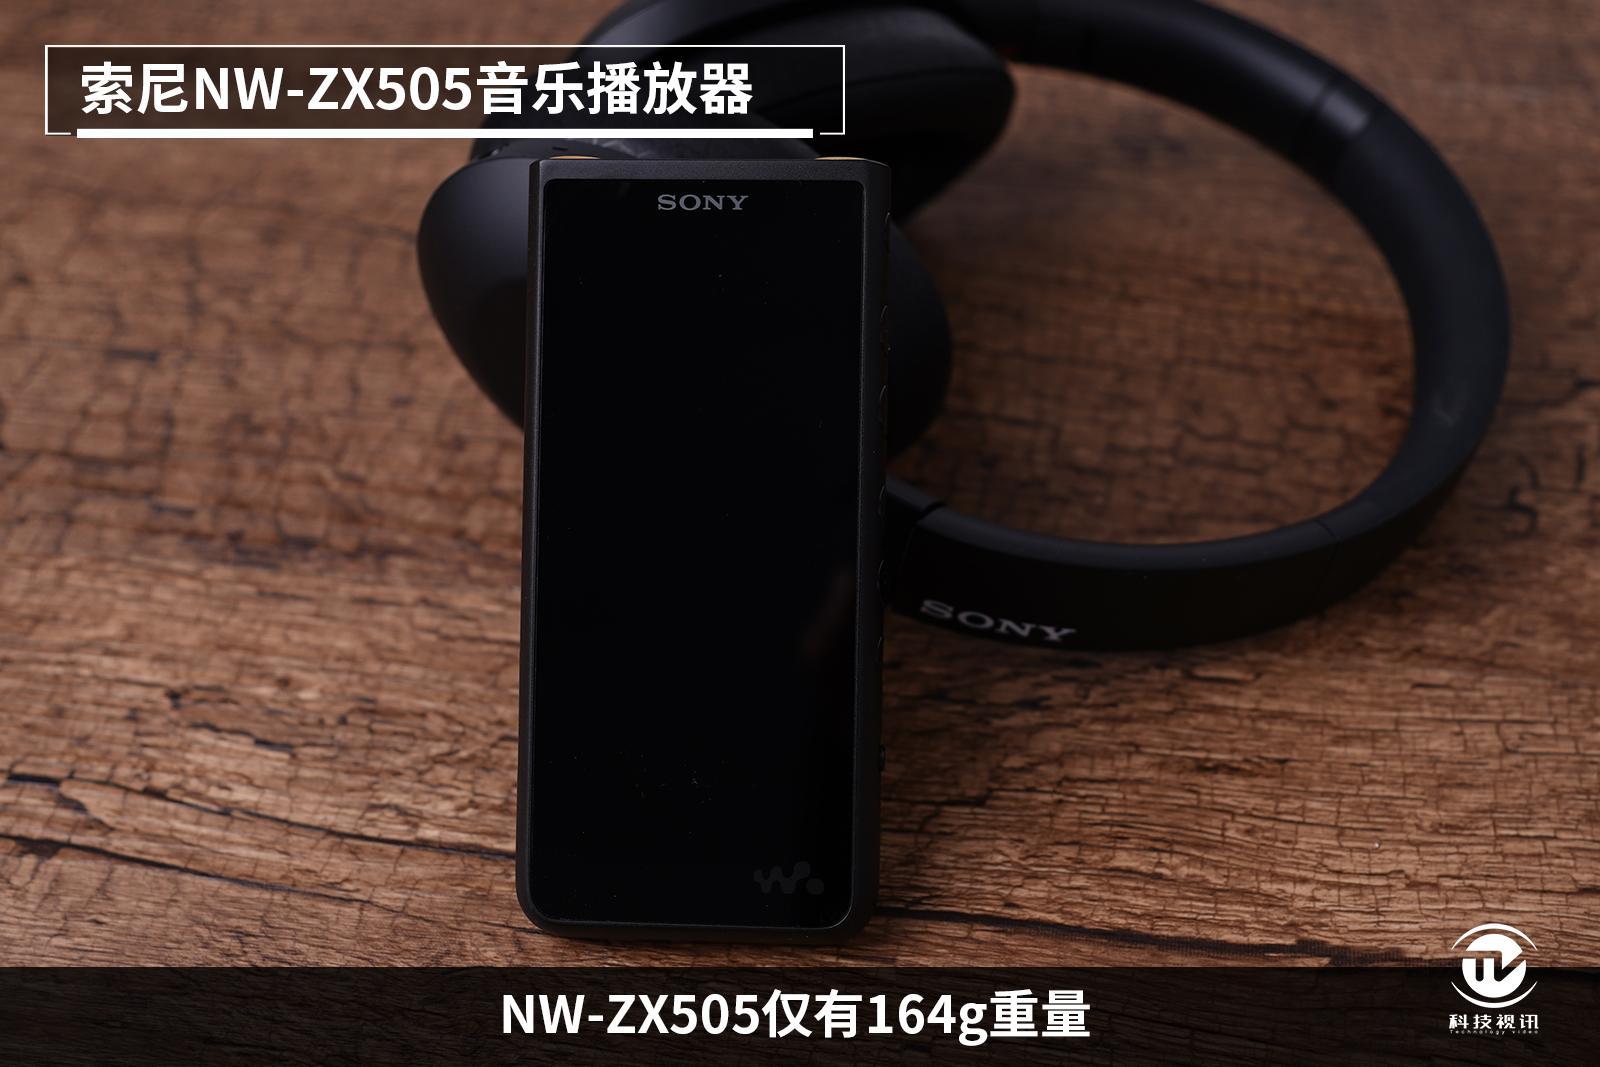 NW-ZX505仅有164g重量.jpg